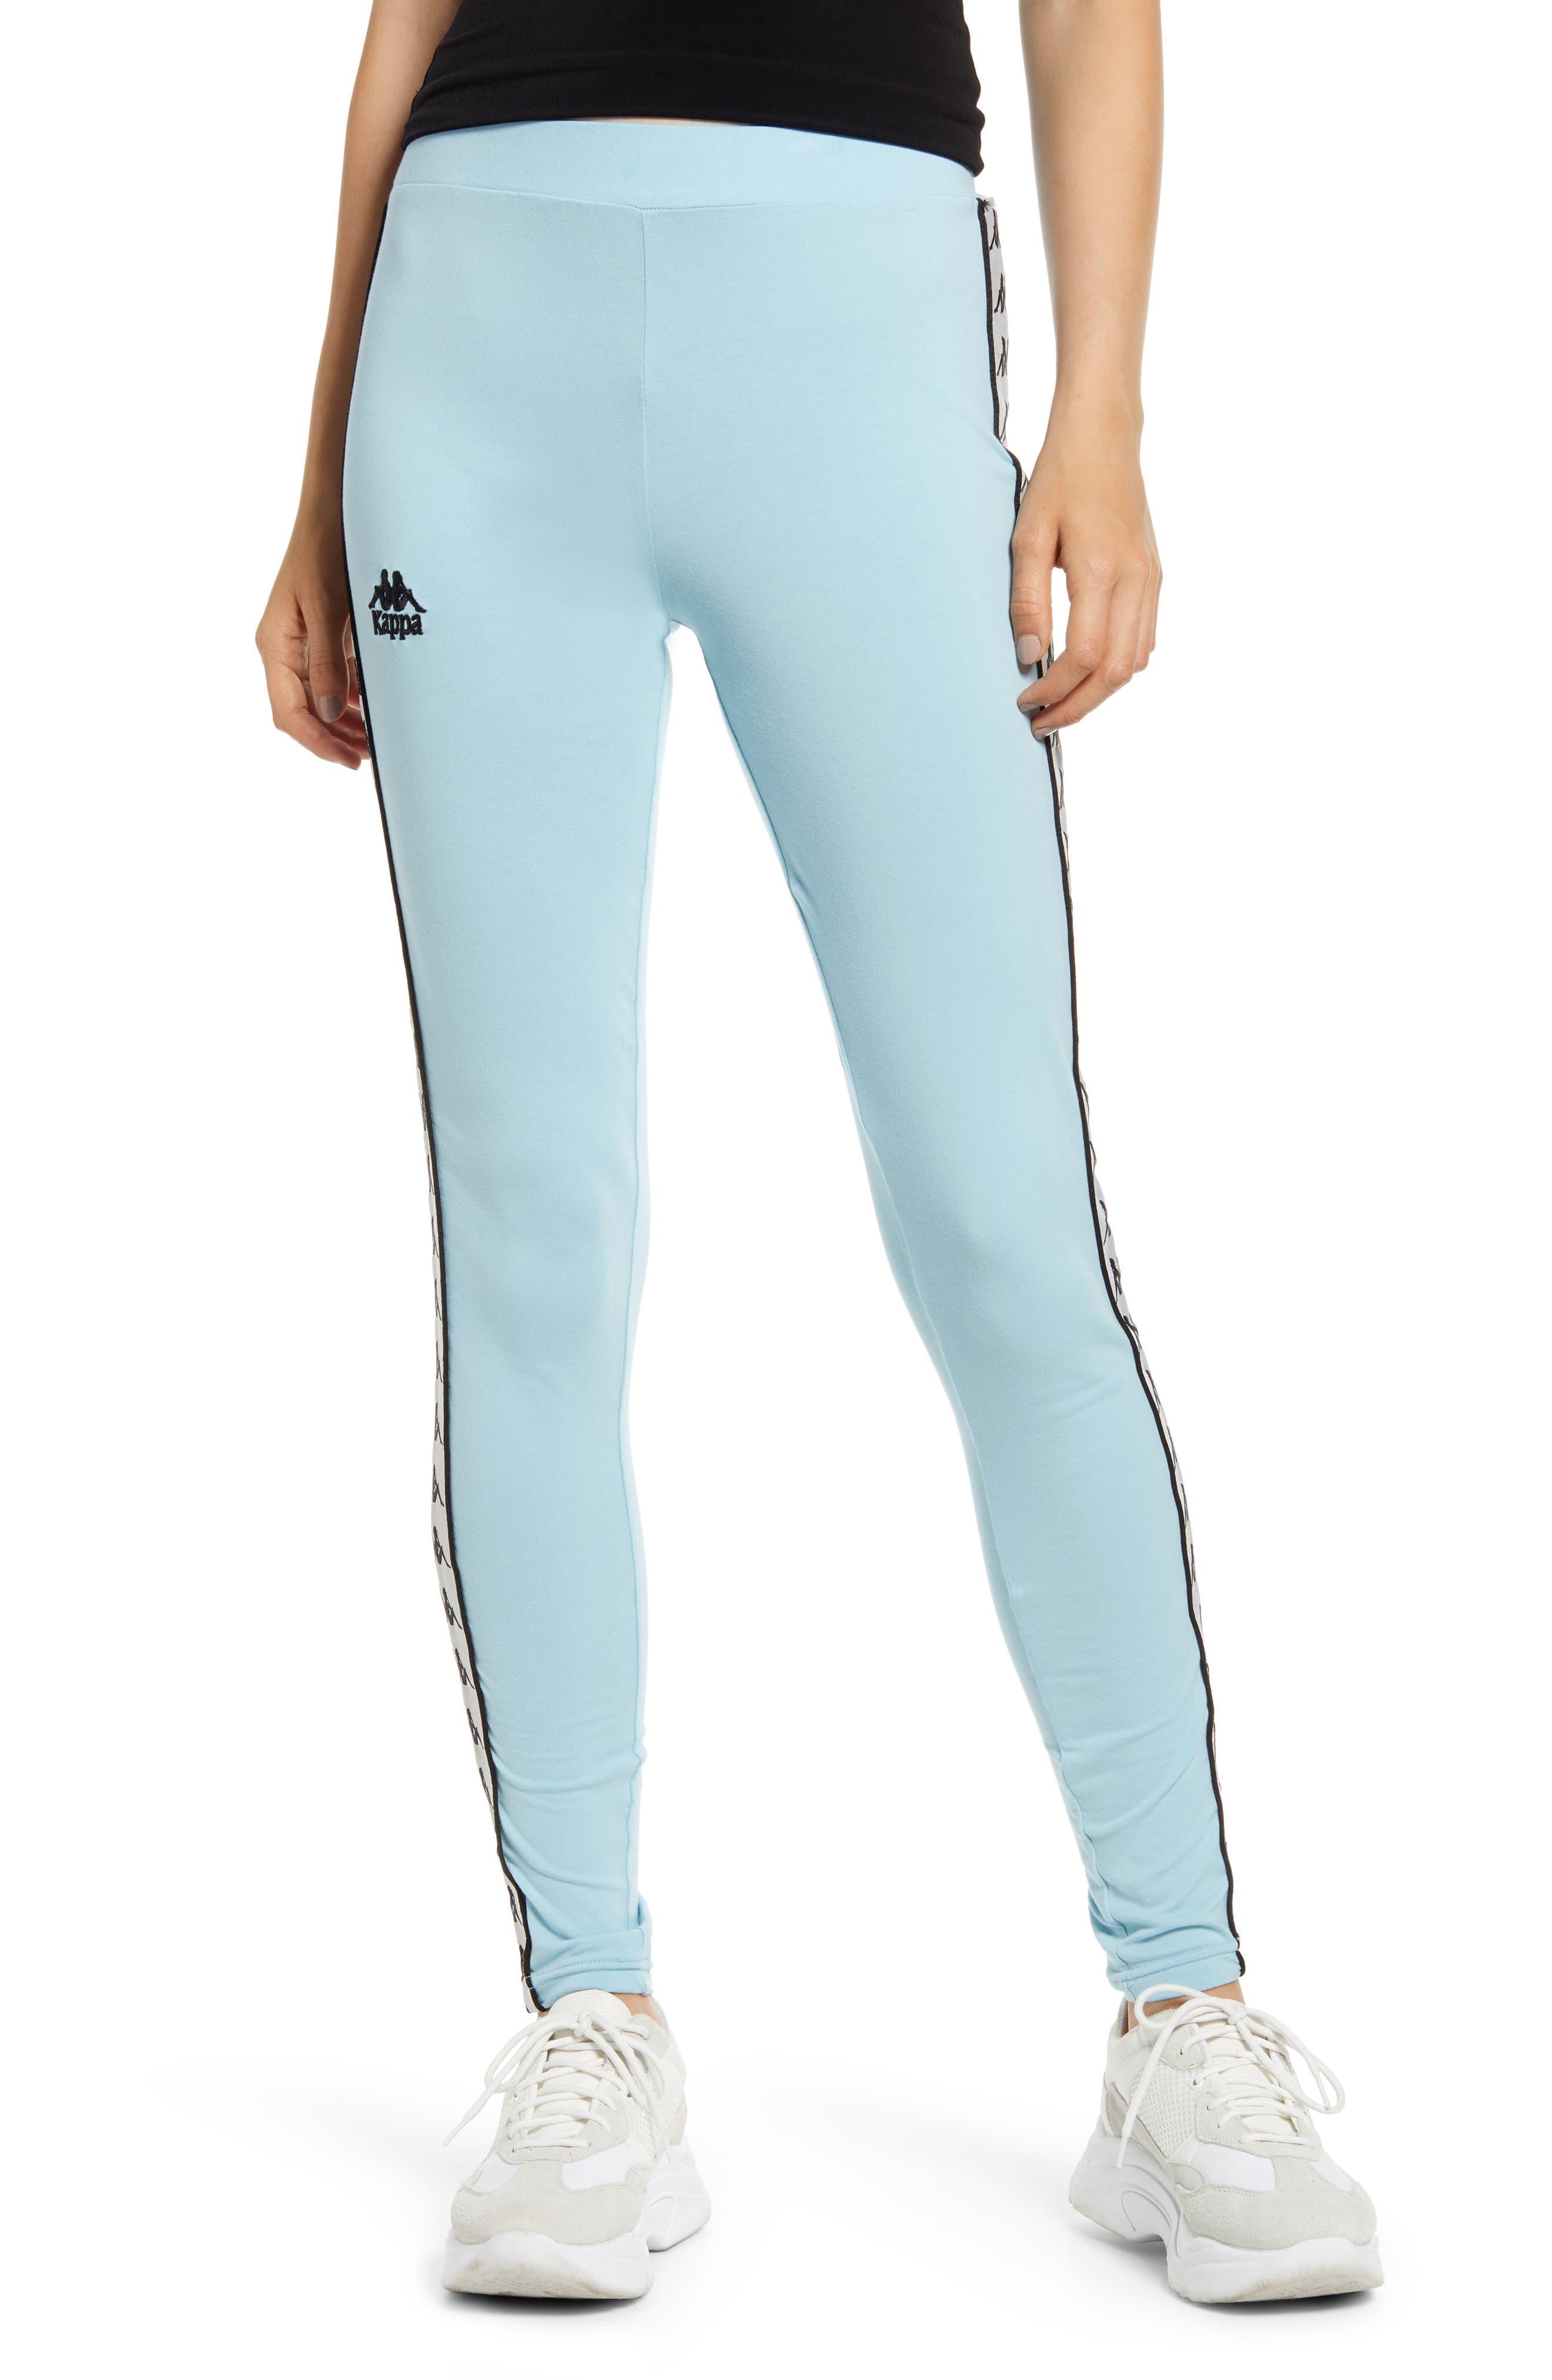 816c53ba09 Women's Kappa Clothing | Nordstrom